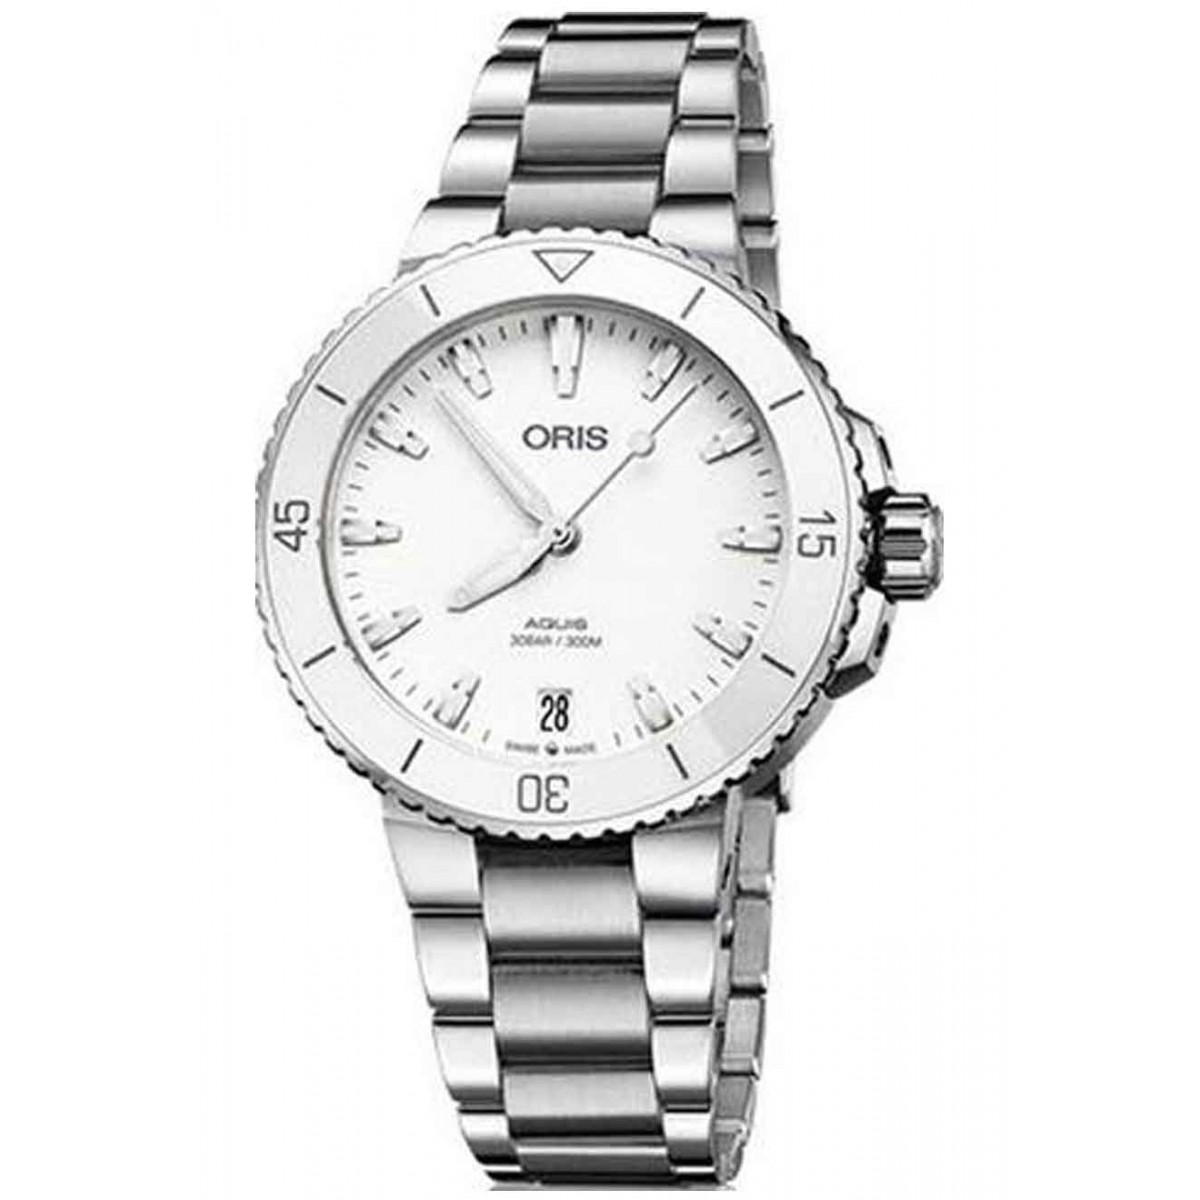 ORIS AQUIS DATE Lady -300 M ∅36,5 mm, Esfera blanca, Caucho blanco